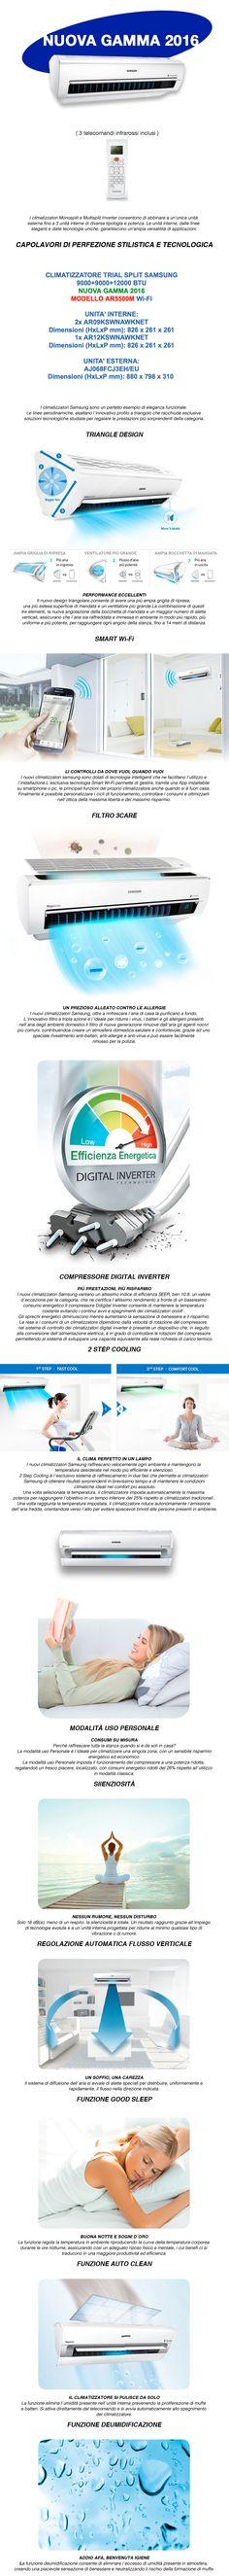 CLIMATIZZATORE TRIAL SPLIT SAMSUNG INVERTER AR5500M SMART WIFI 9+9+12 AJ068FCJ3EH/EU AR5500 The New Generation Store